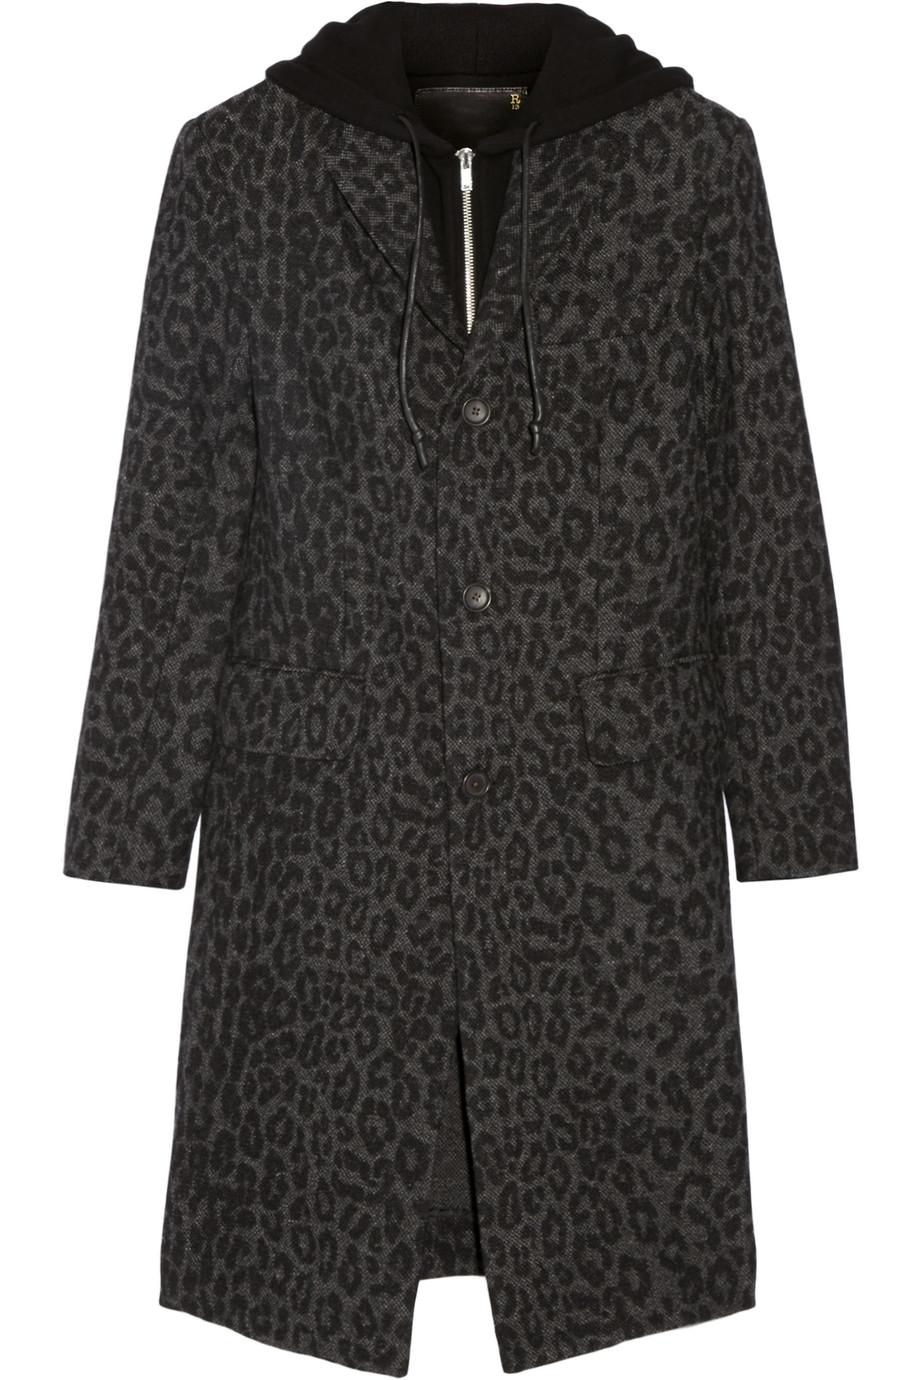 R13 Hooded Leopard-Print Wool-Blend Coat, Size: S